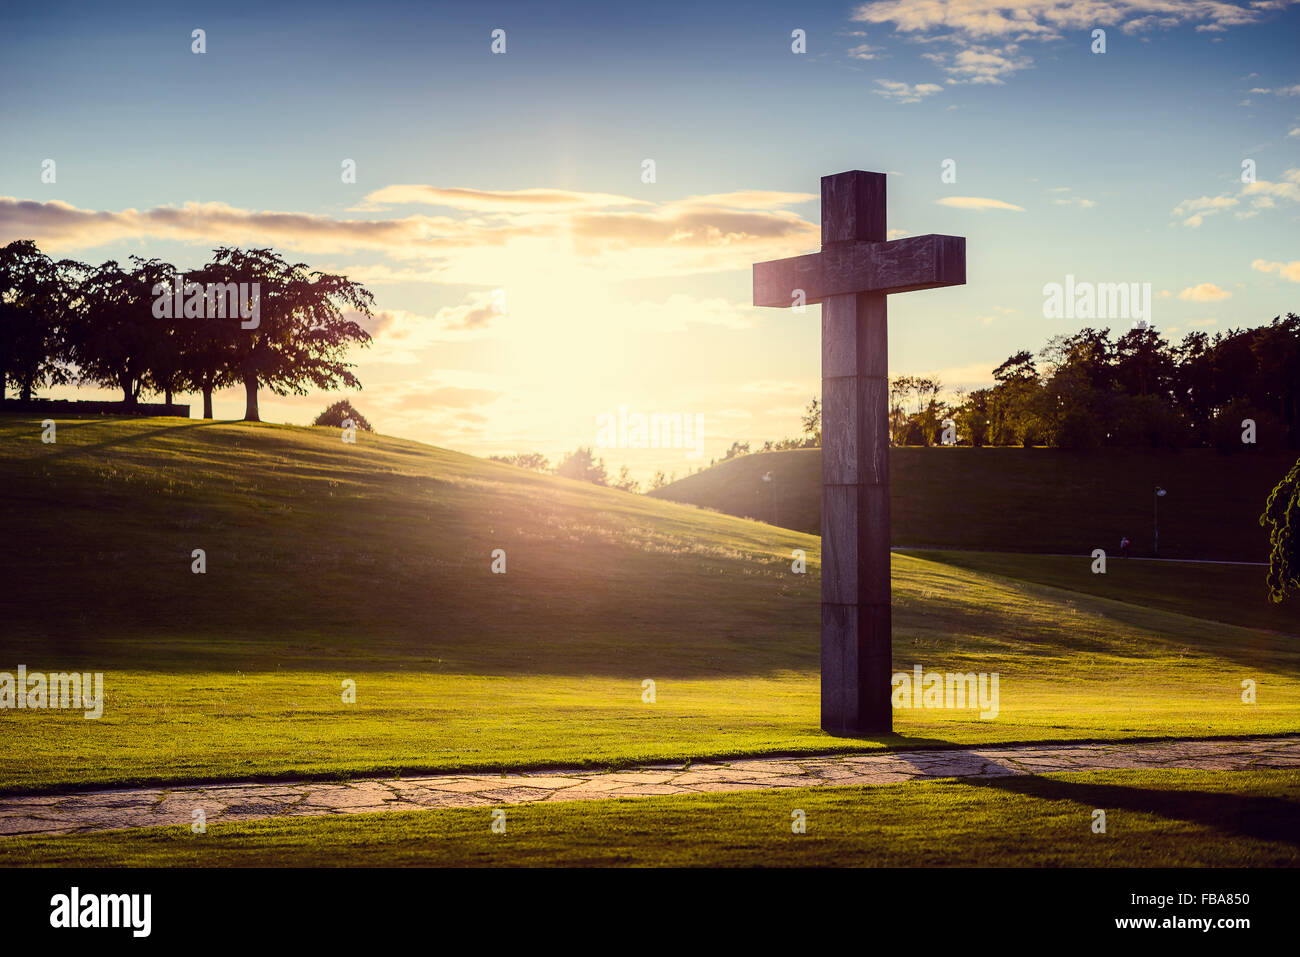 Sweden, Sodermanland, Stockholm, Gamla Enskede, Skogskyrkogarden, Cross in green valley at sunset - Stock Image